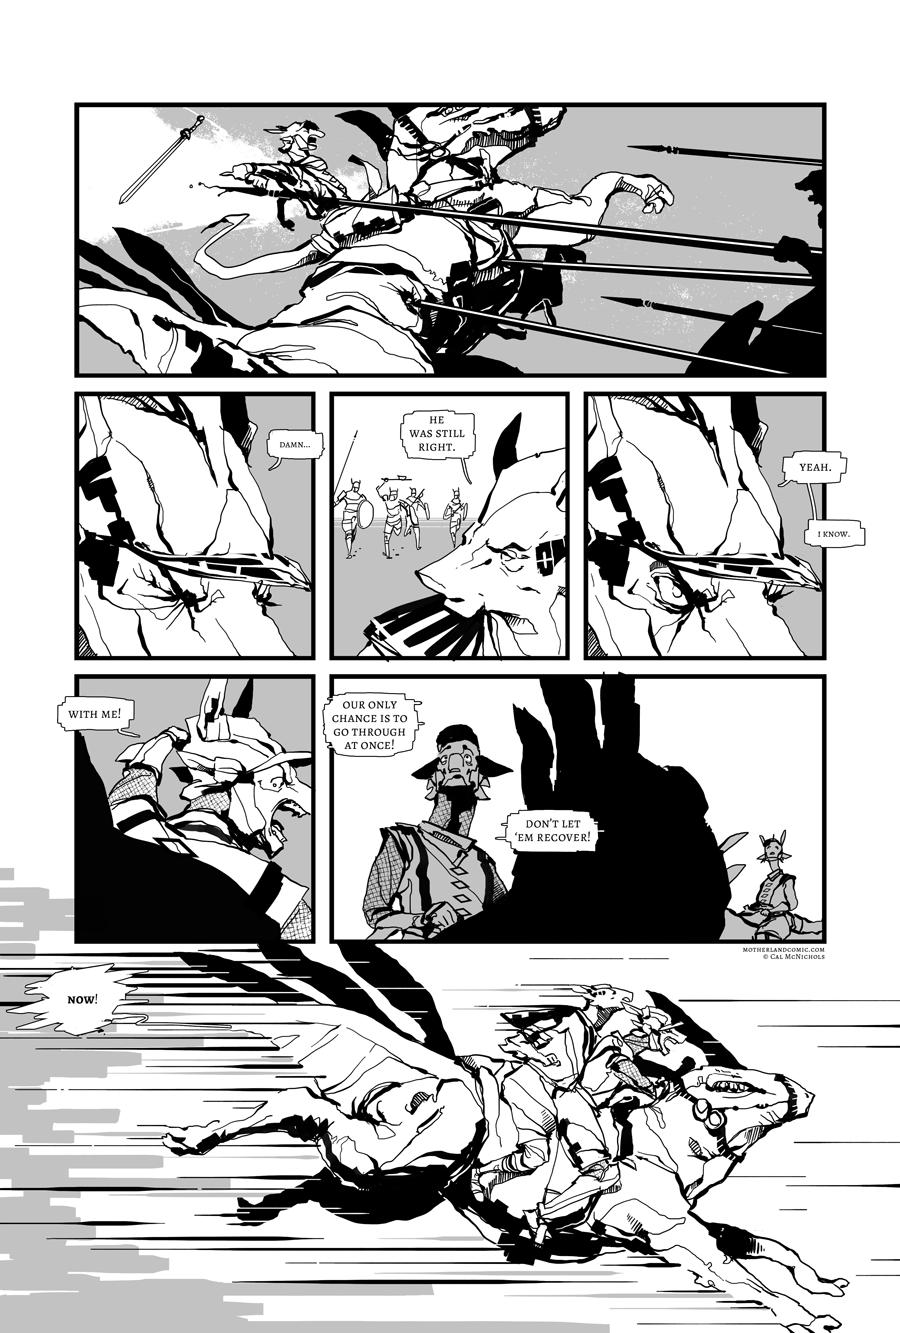 pg 42